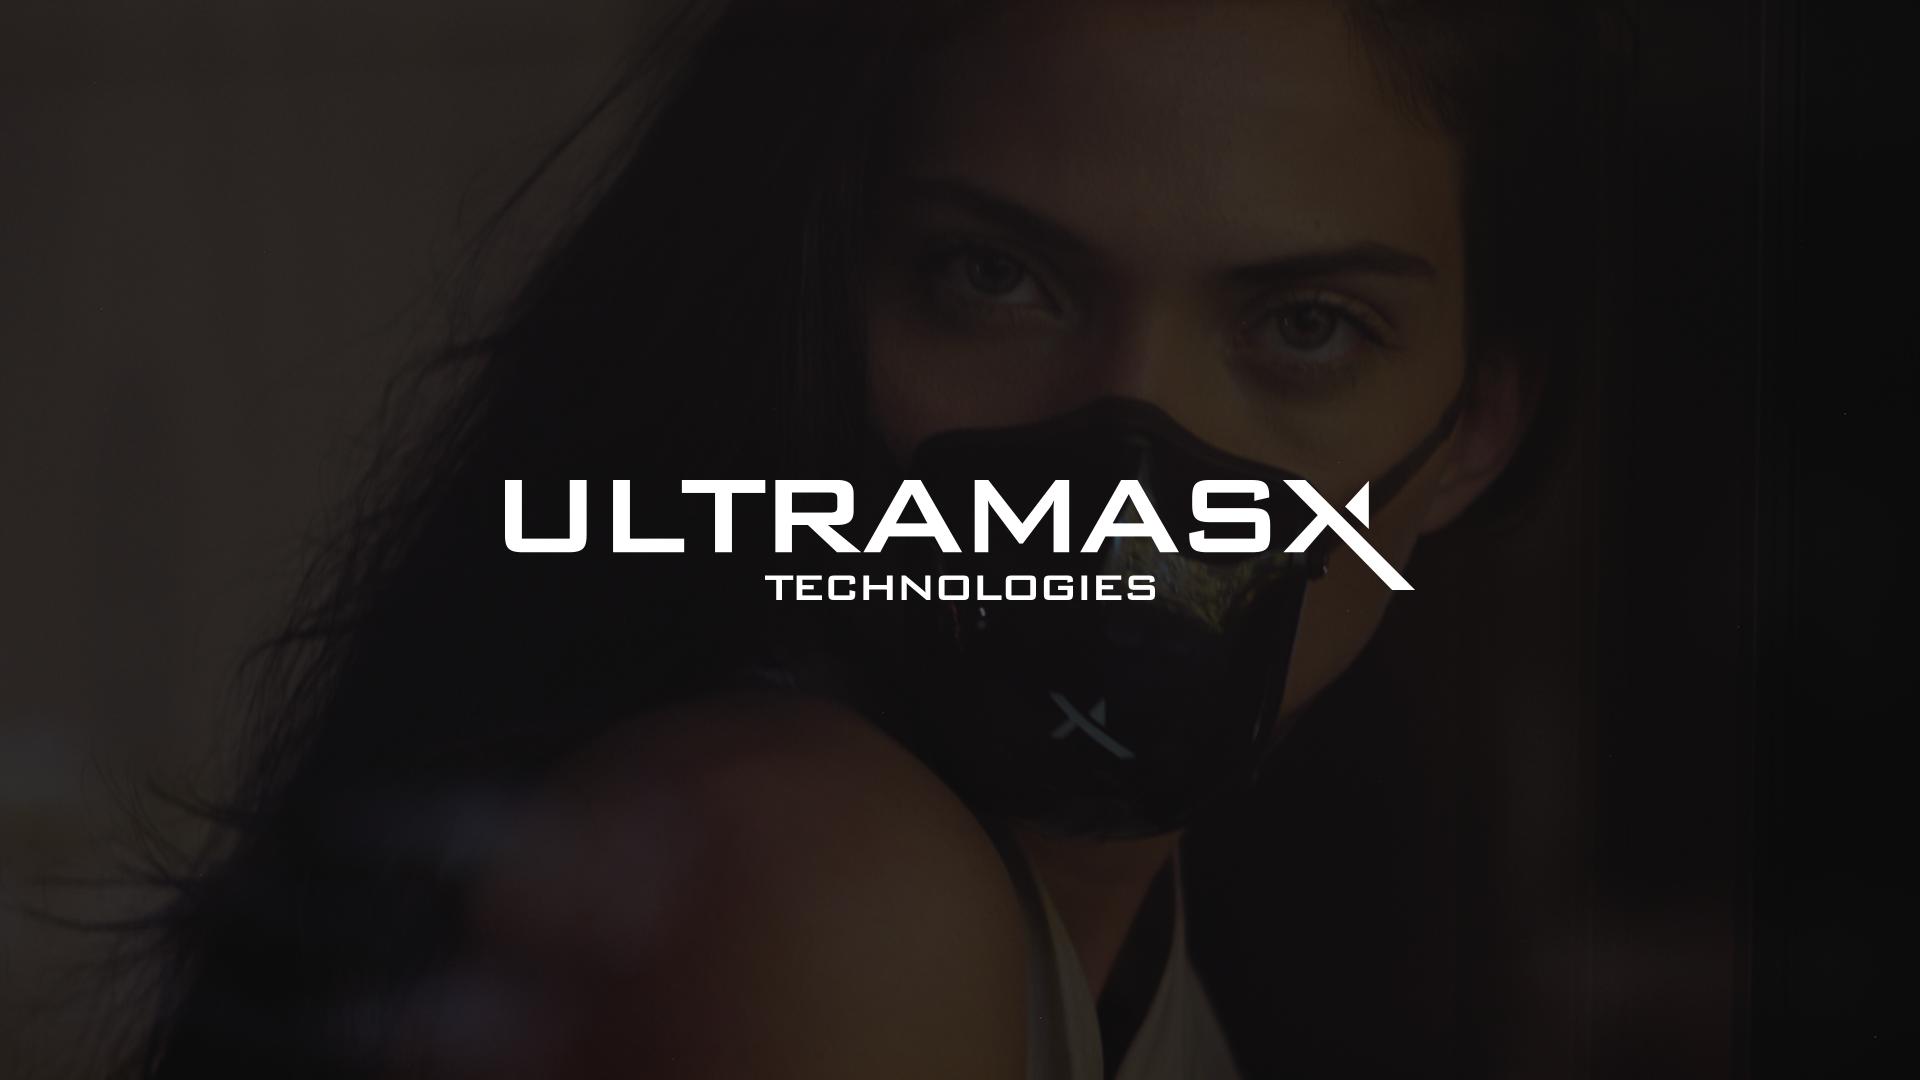 Ultramasx - The World's Most Advanced Fan-Assisted Respirator Mask